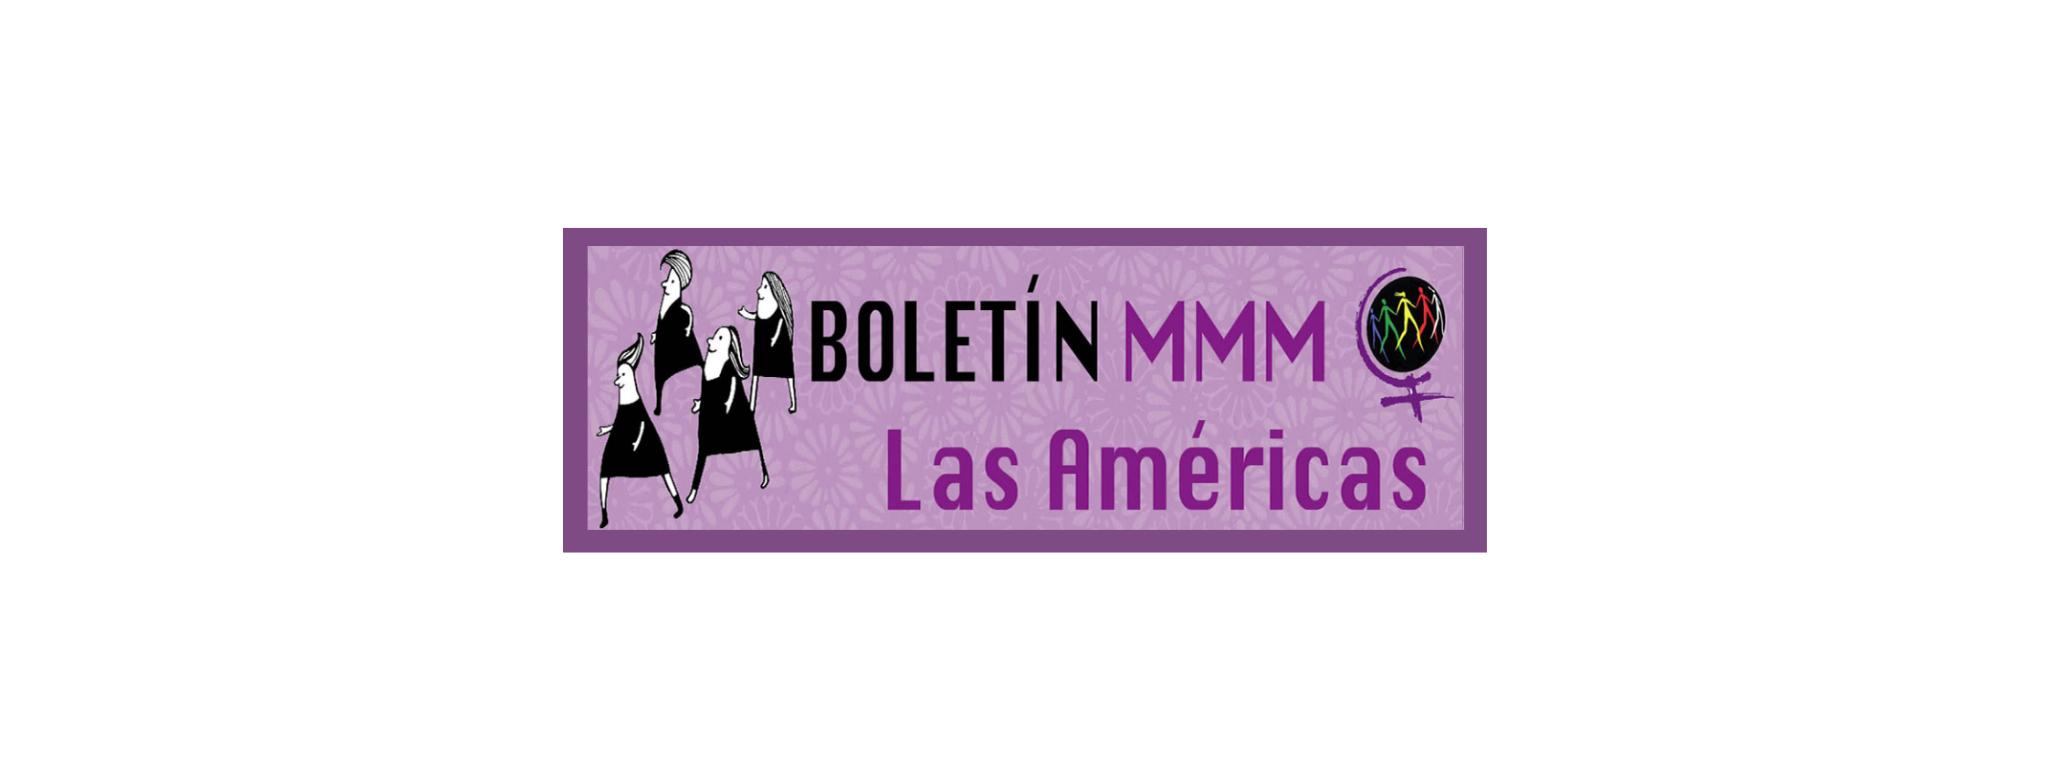 Boletín MMM Las Américas - Junio 2021